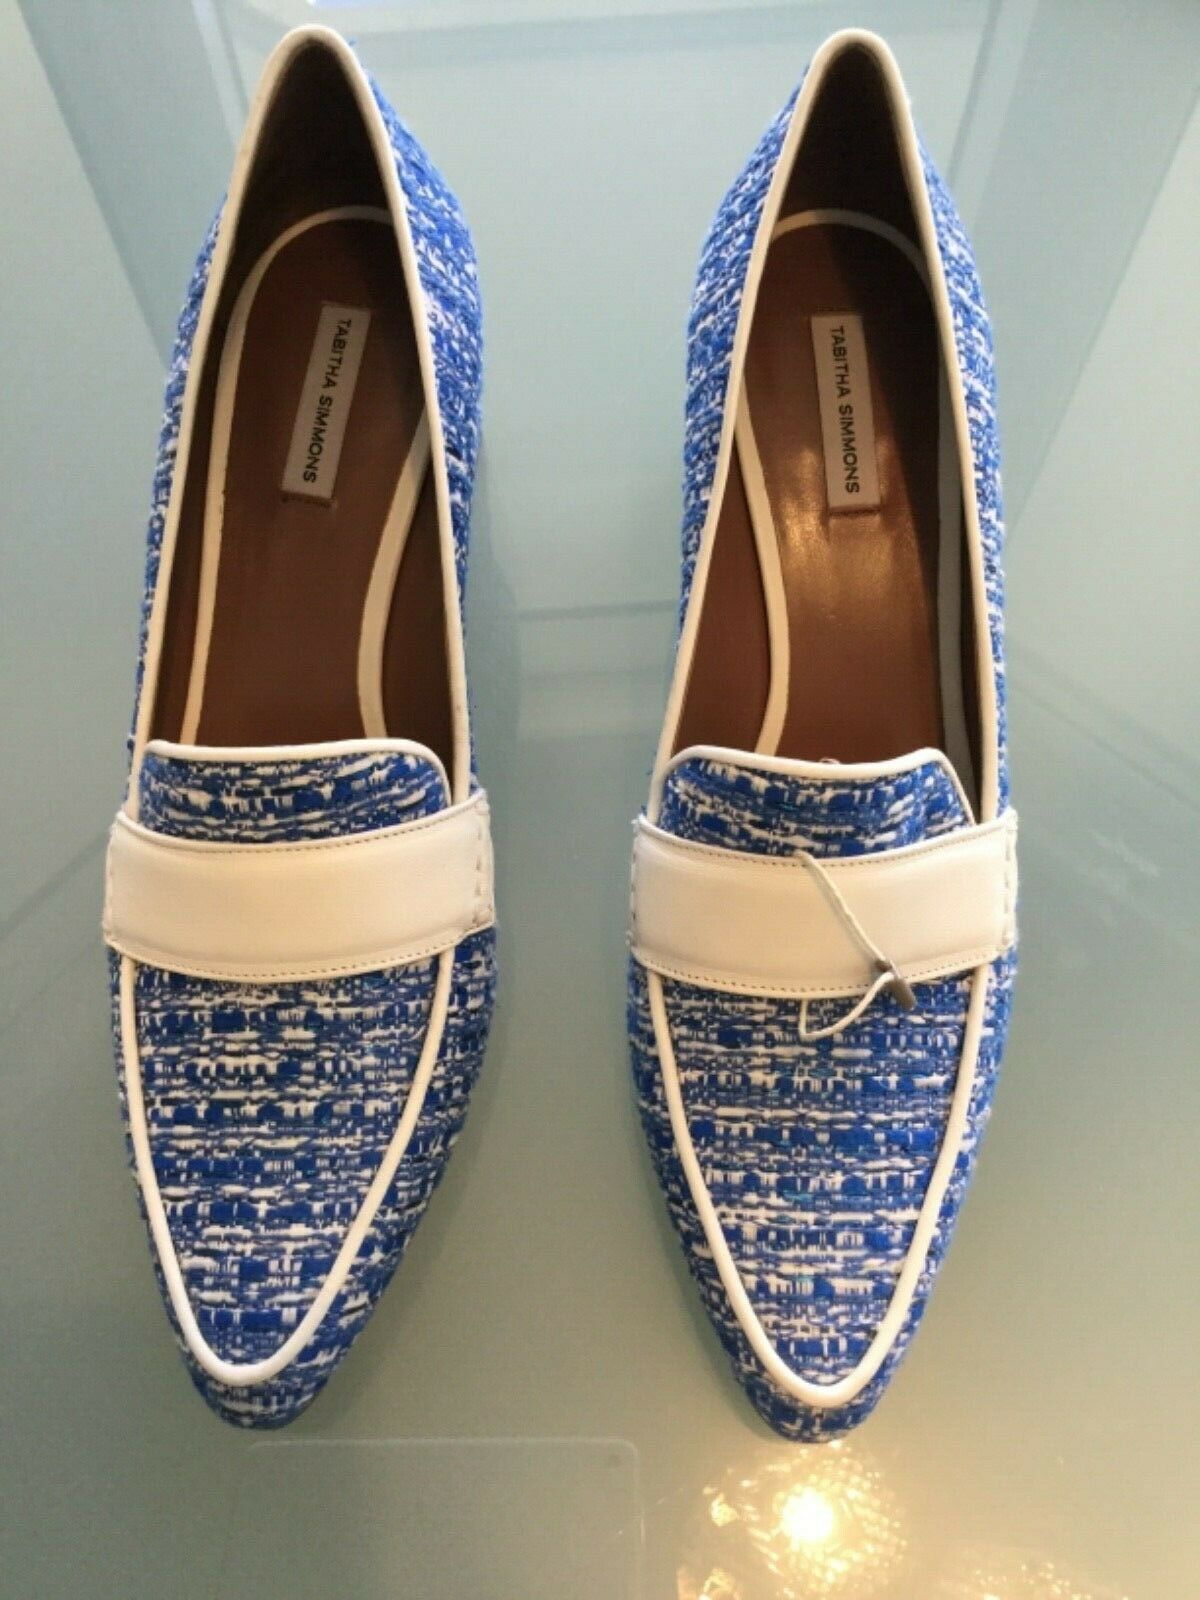 qualità ufficiale TABITHA SIMMONS MARGOT MARGOT MARGOT heeled loafer pump, sz 40.5  blu bianca  Mocassin  servizio premuroso